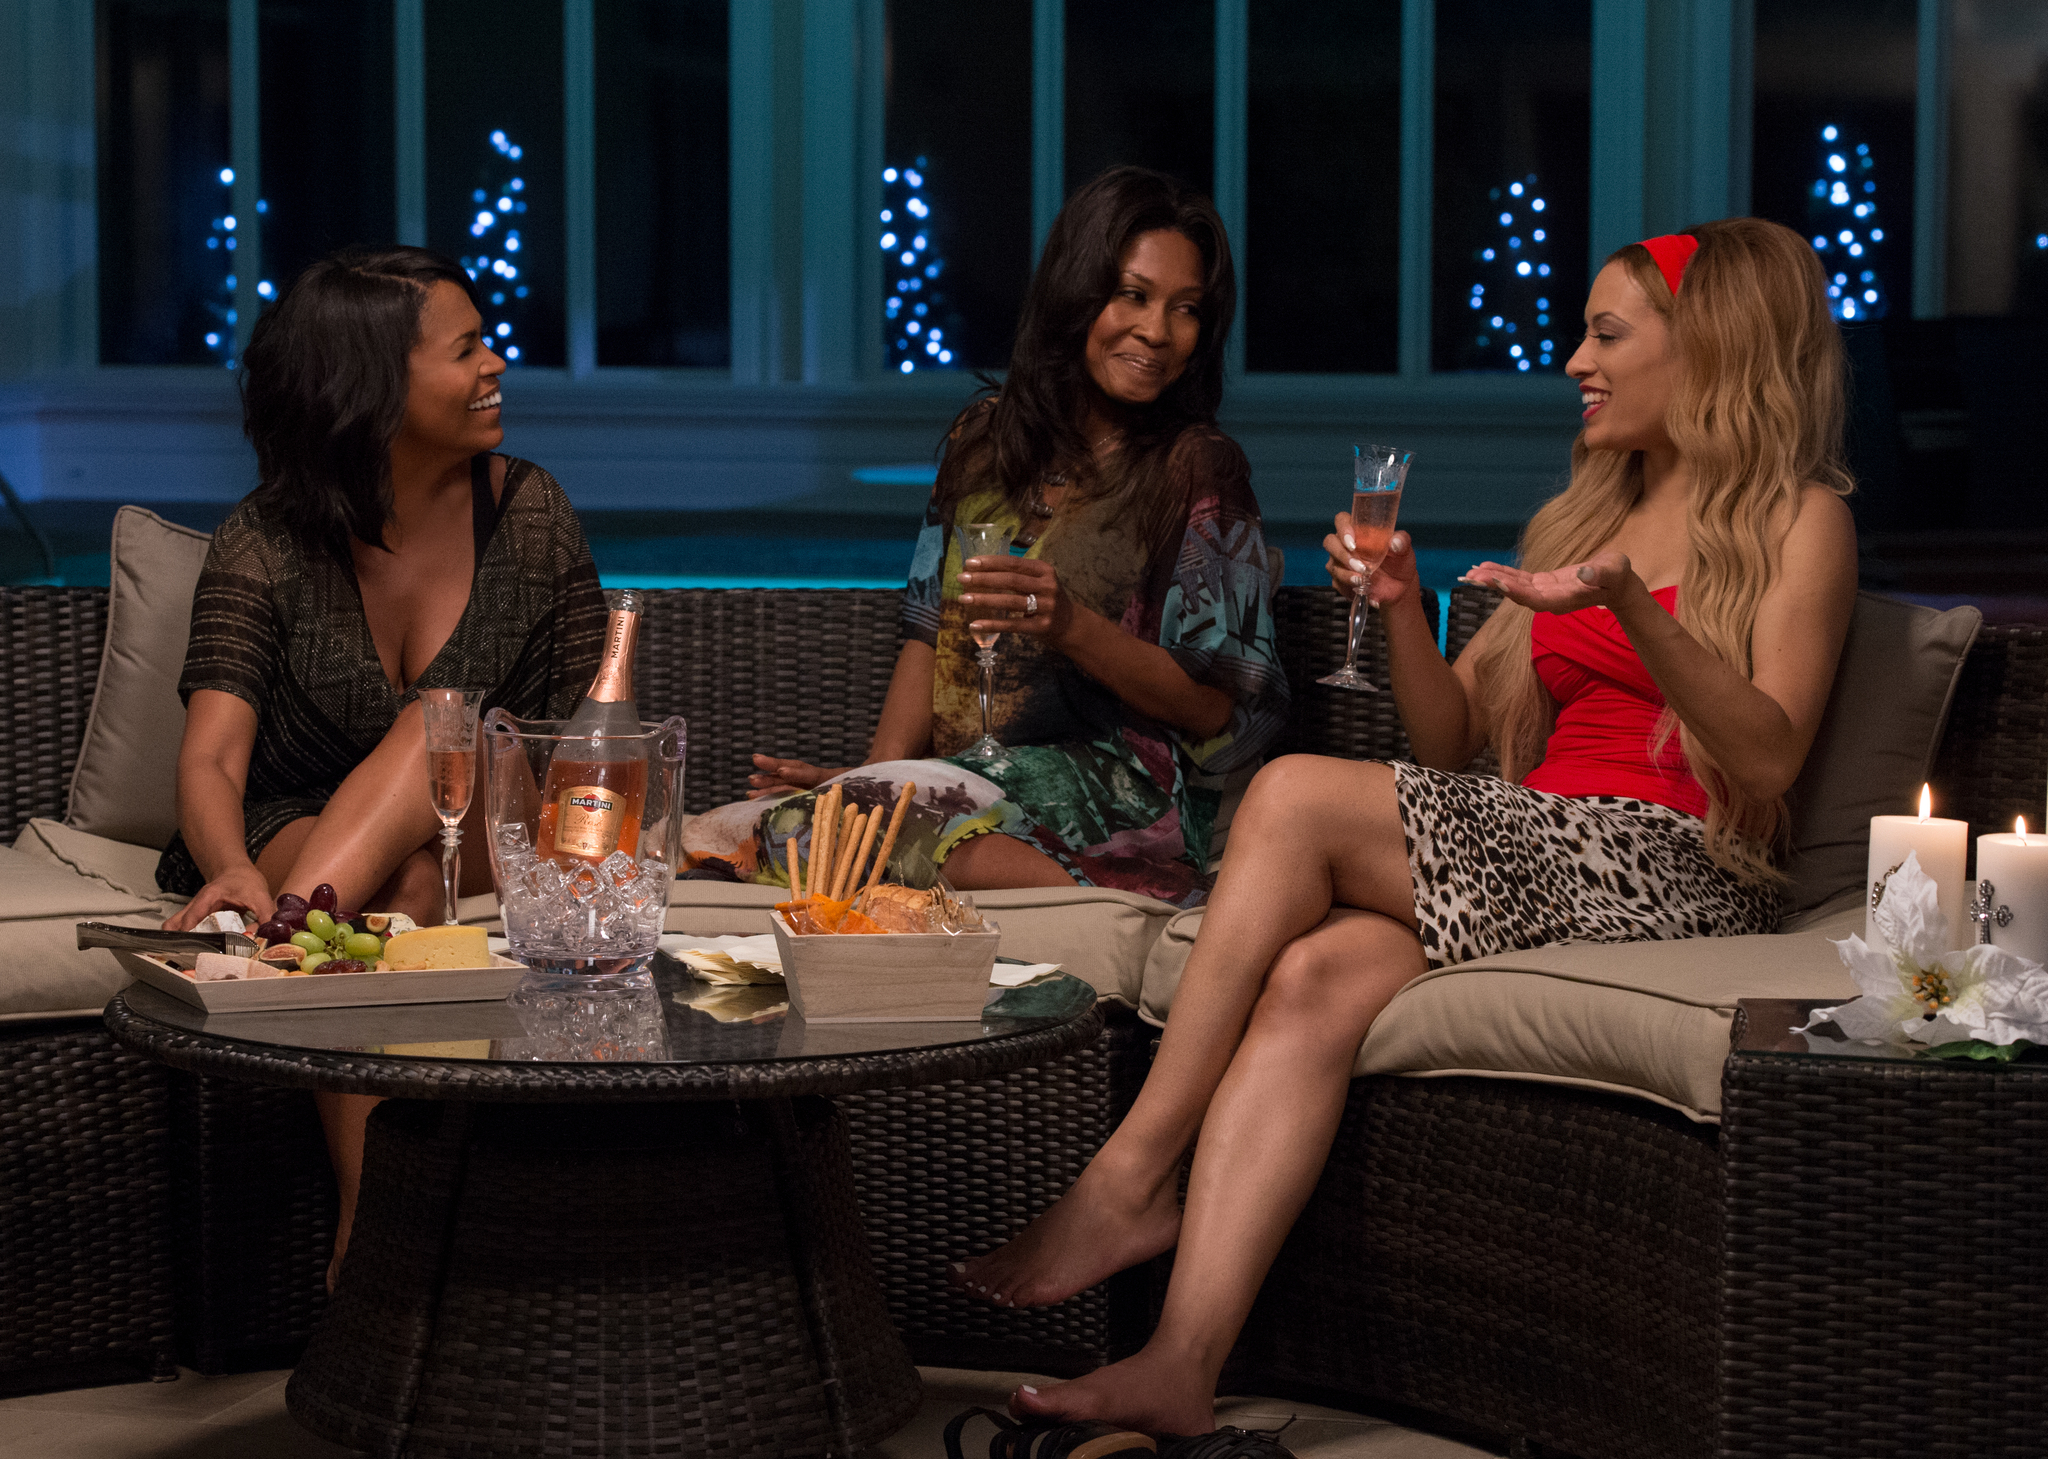 Nia Long, Monica Calhoun, and Melissa De Sousa in The Best Man Holiday (2013)